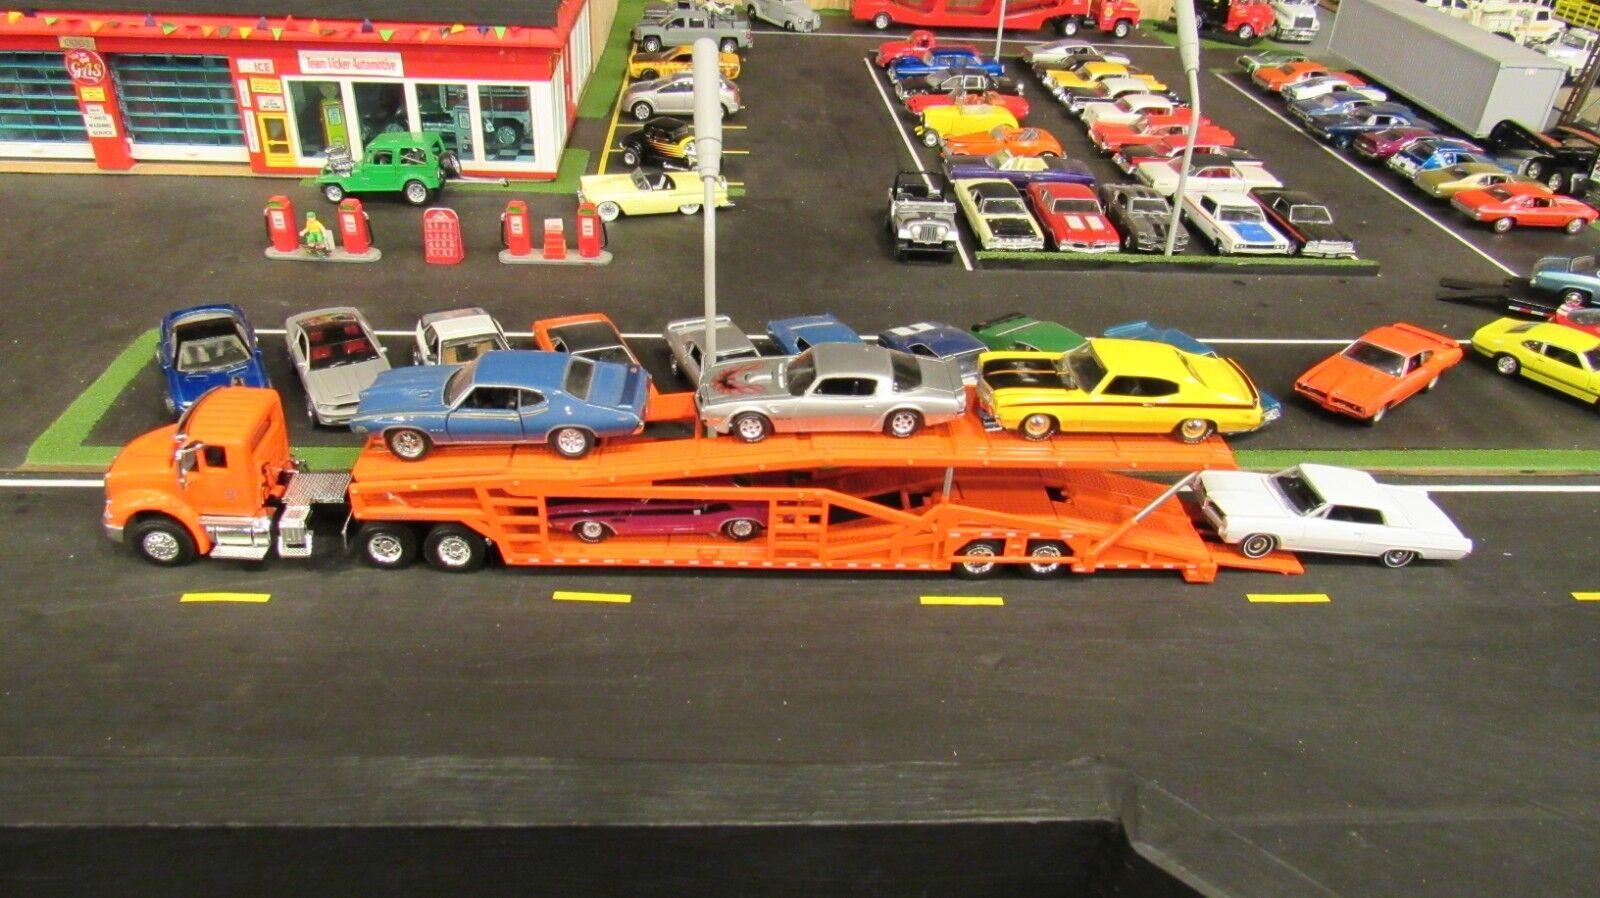 SPECCAST Orange IH 8600 SEMI CAR TRANSPORT TRANSPORTER CARRIER TRAILER 1 64  MTB